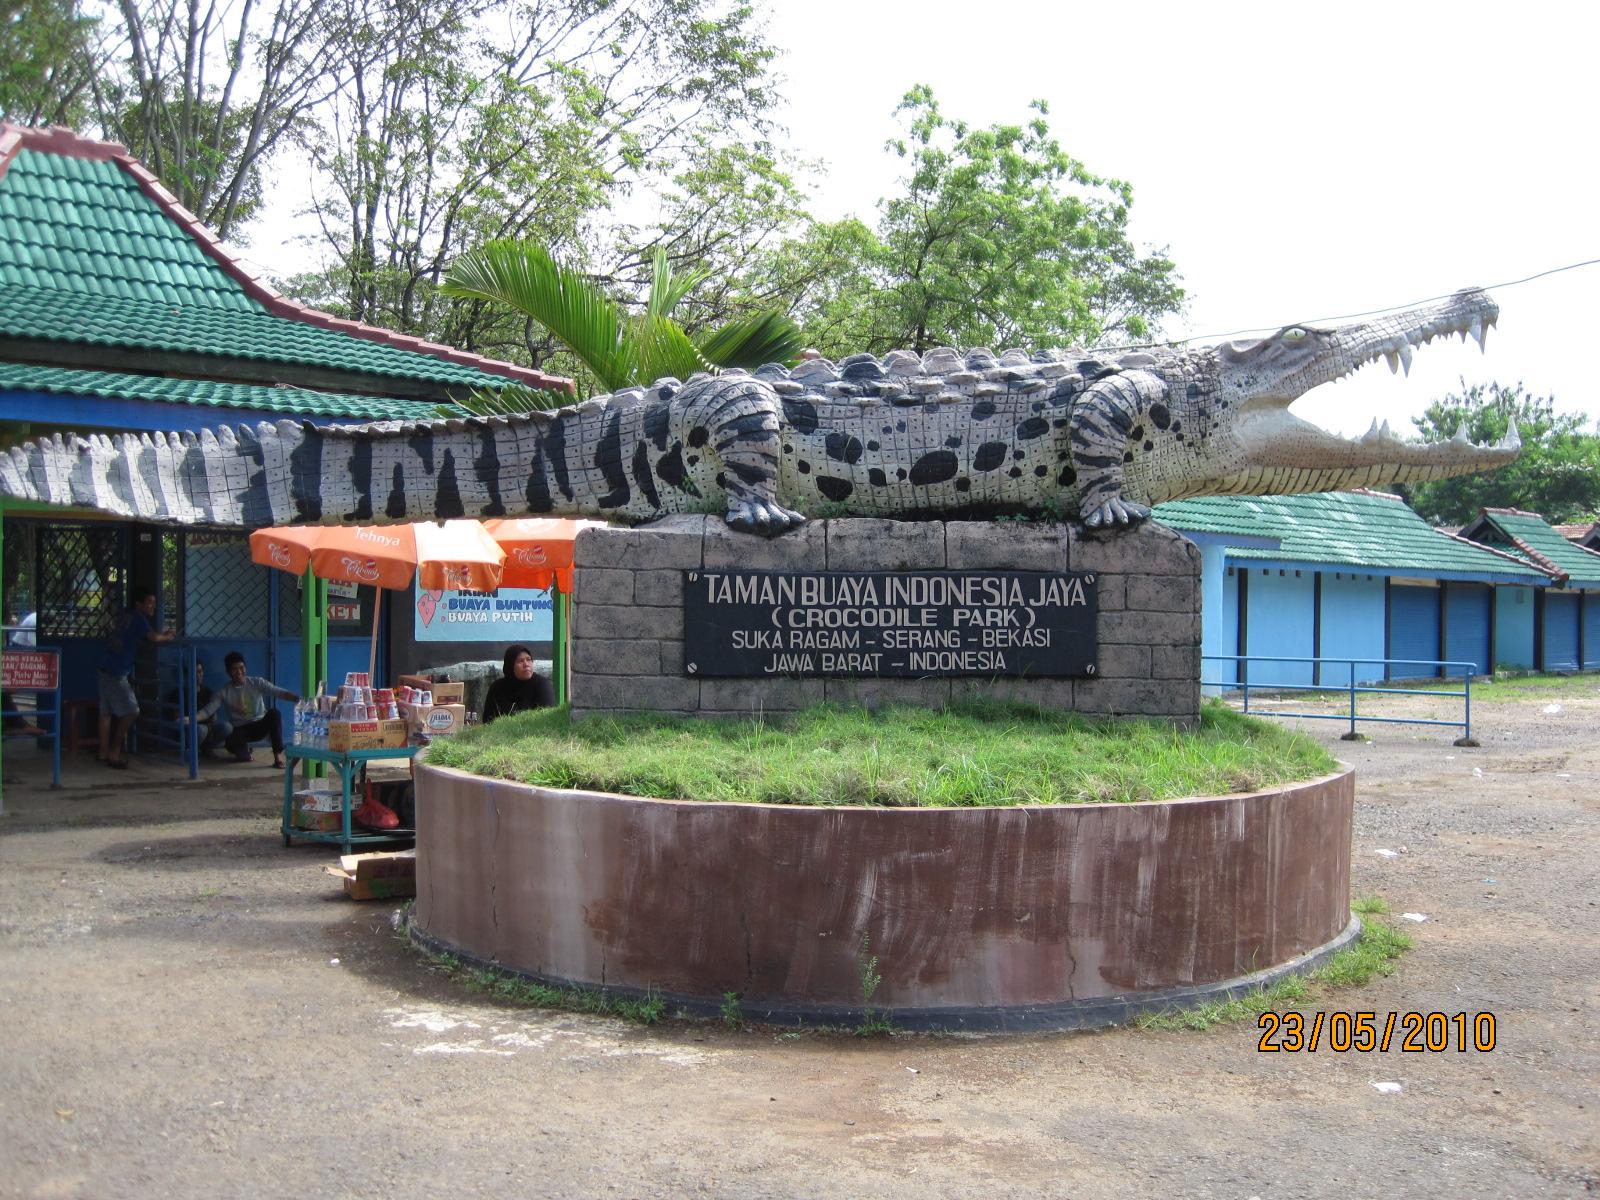 Wisata Tempat Bekasi Asik Unik Mengamati Reptil Pemangsa Taman Buaya